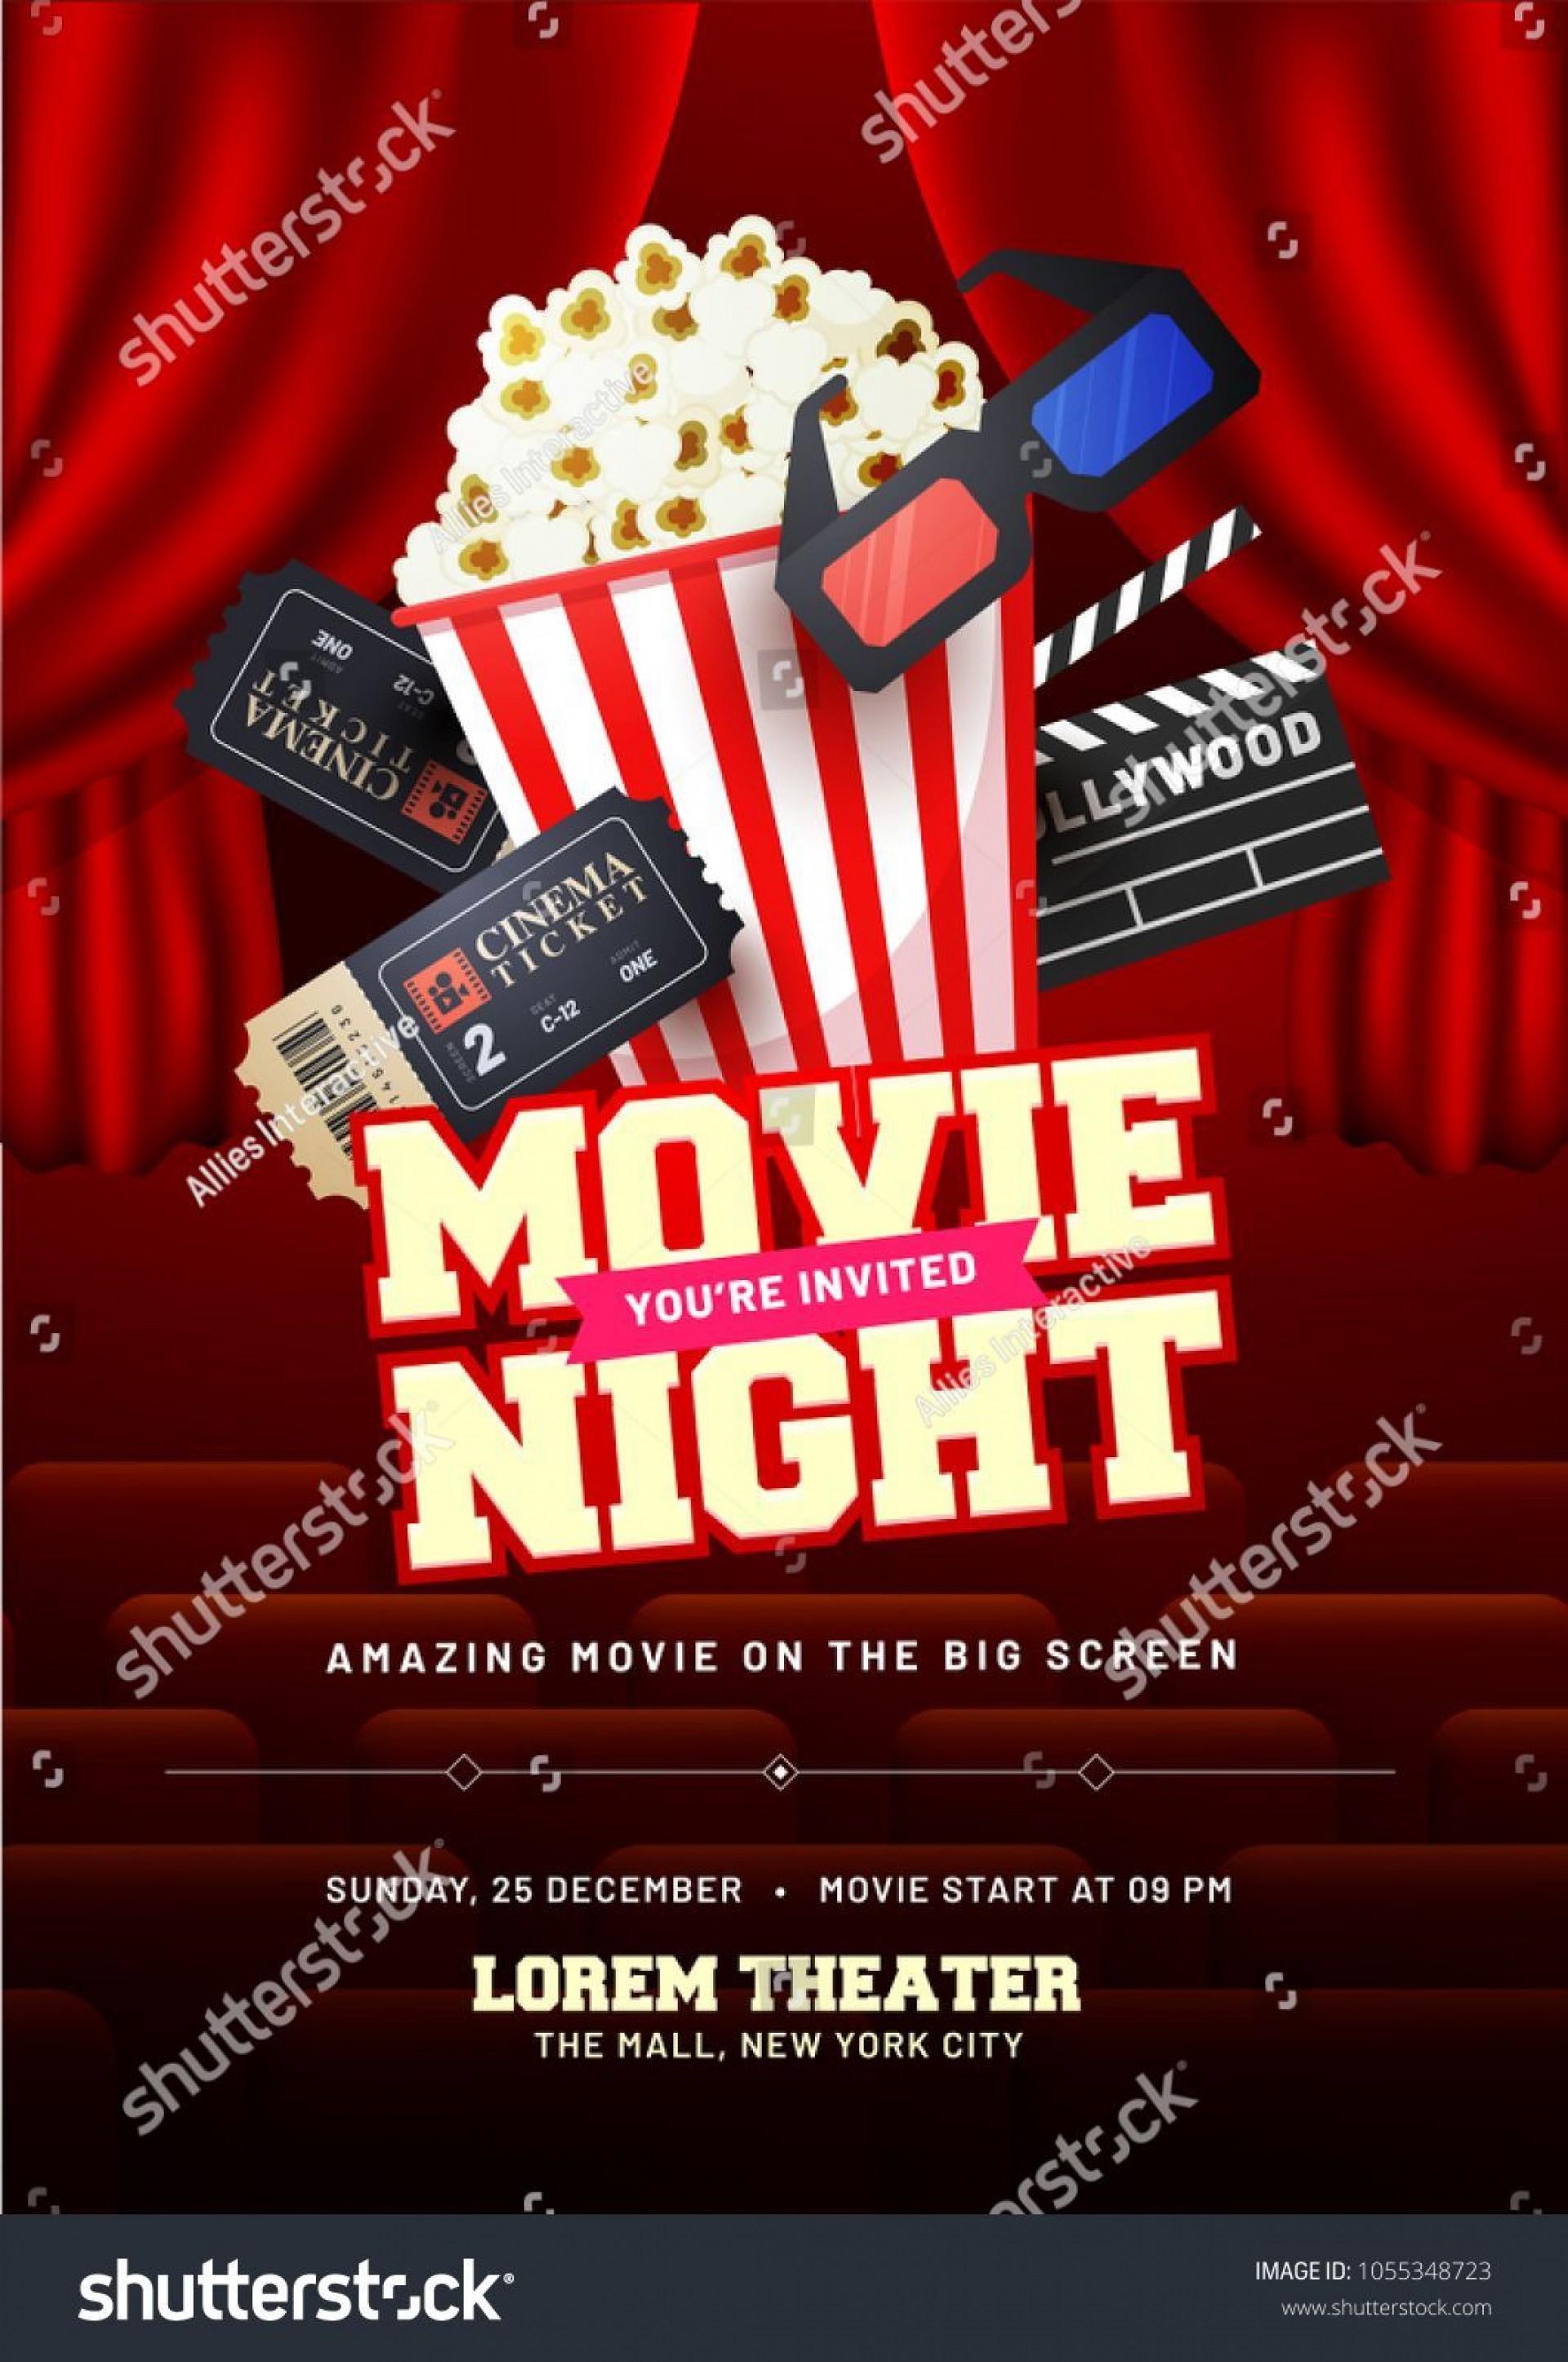 003 Stunning Movie Night Flyer Template Design  Templates Free Microsoft Word1920